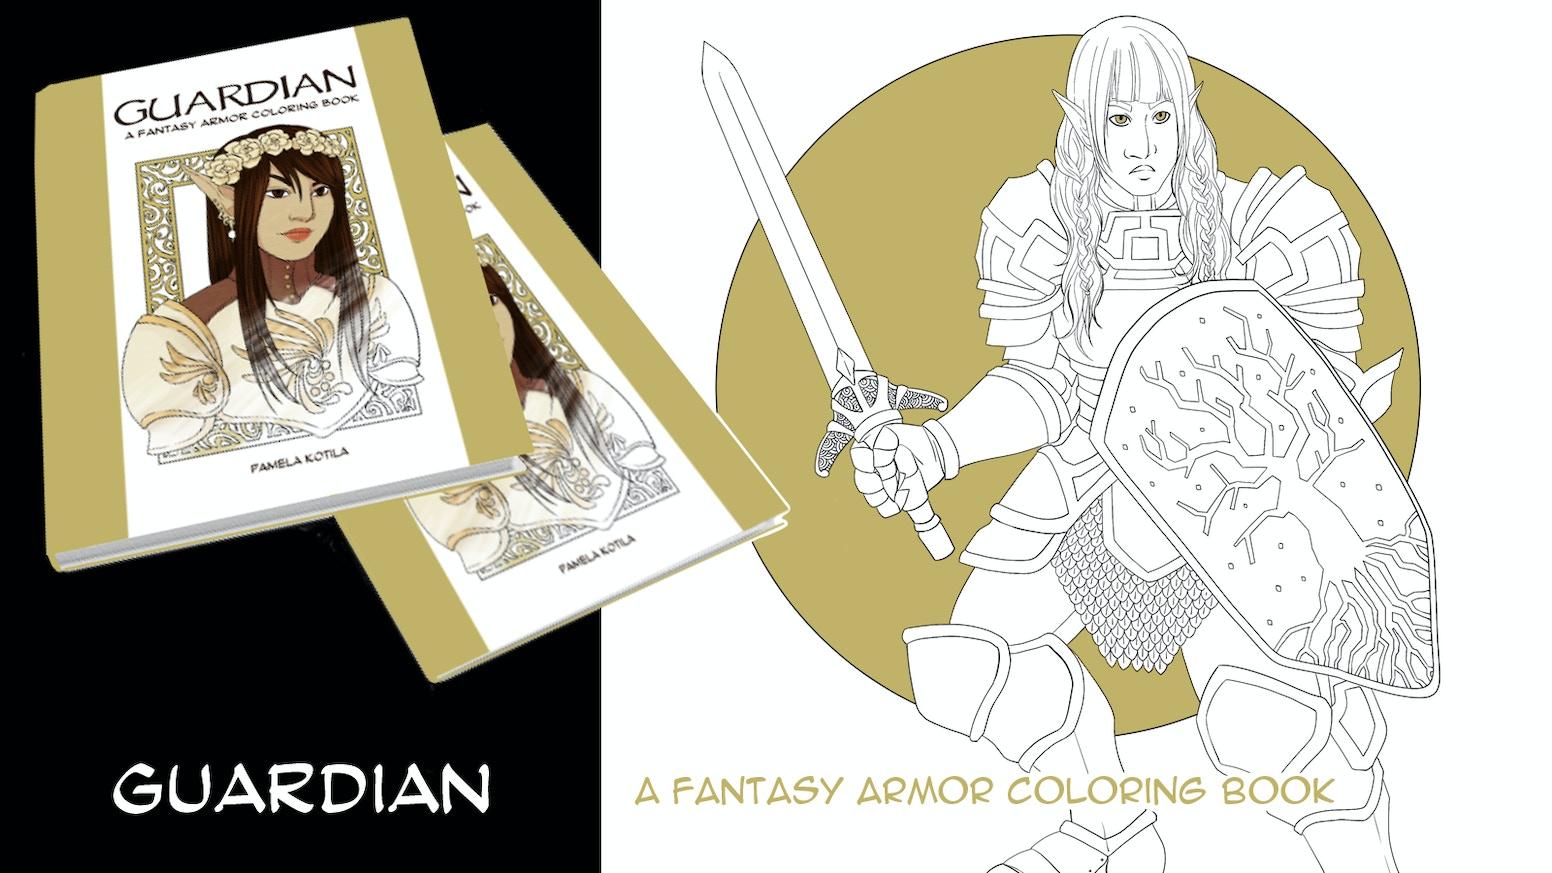 Guardian: a Fantasy Coloring Book of Women in Armor by Pamela Kotila ...